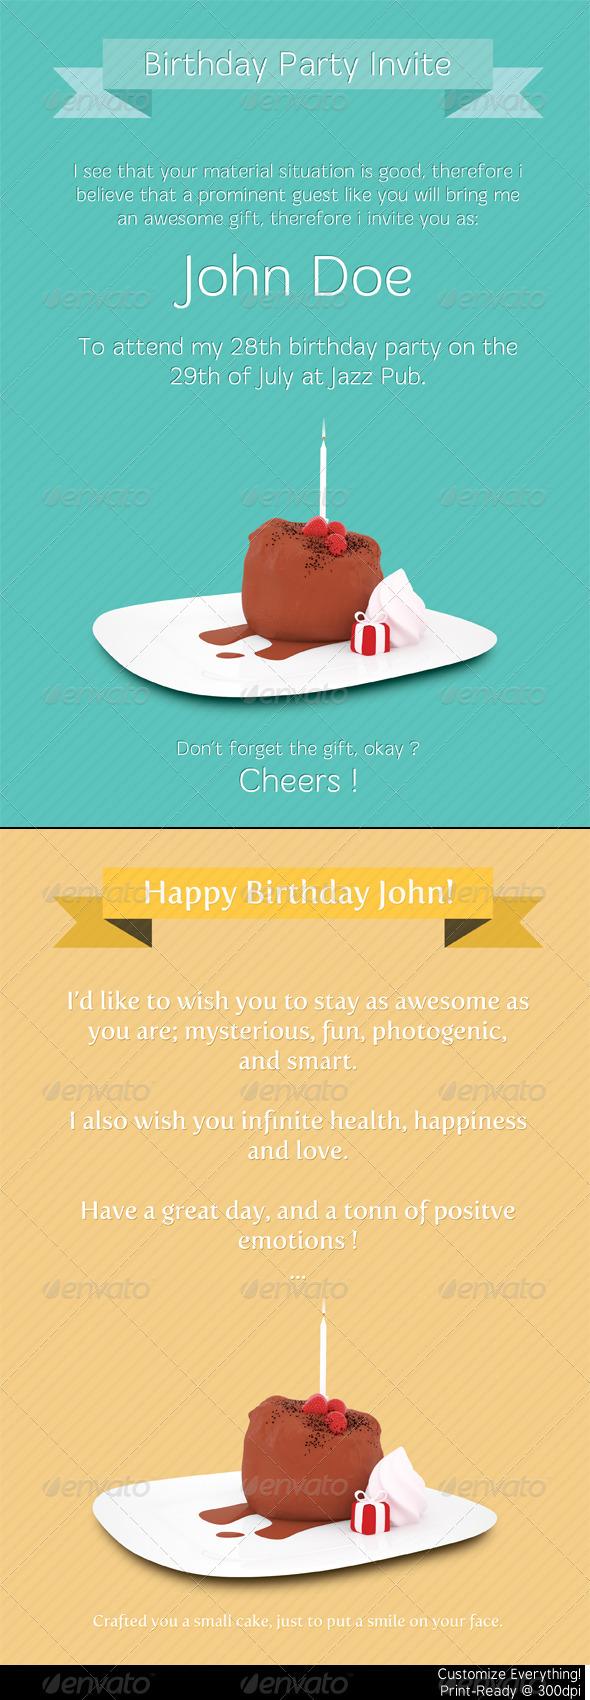 Birthday Print Templates - Birthday Greeting Cards